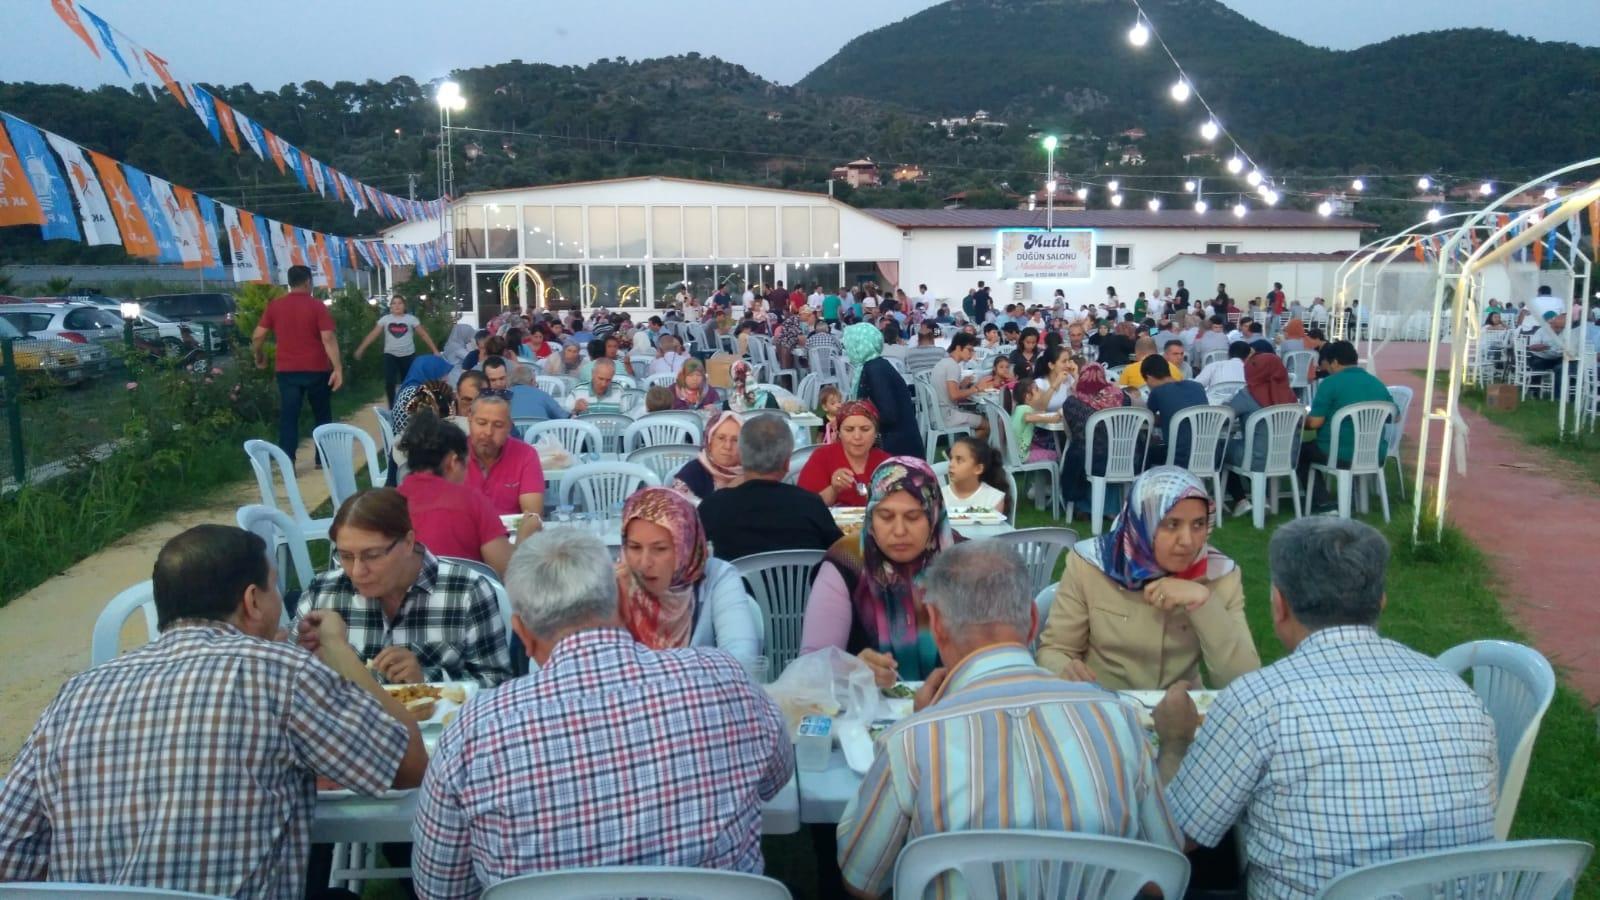 IMG 20180608 WA0024 - Dalaman AK Parti İftar yemeği düzenledi